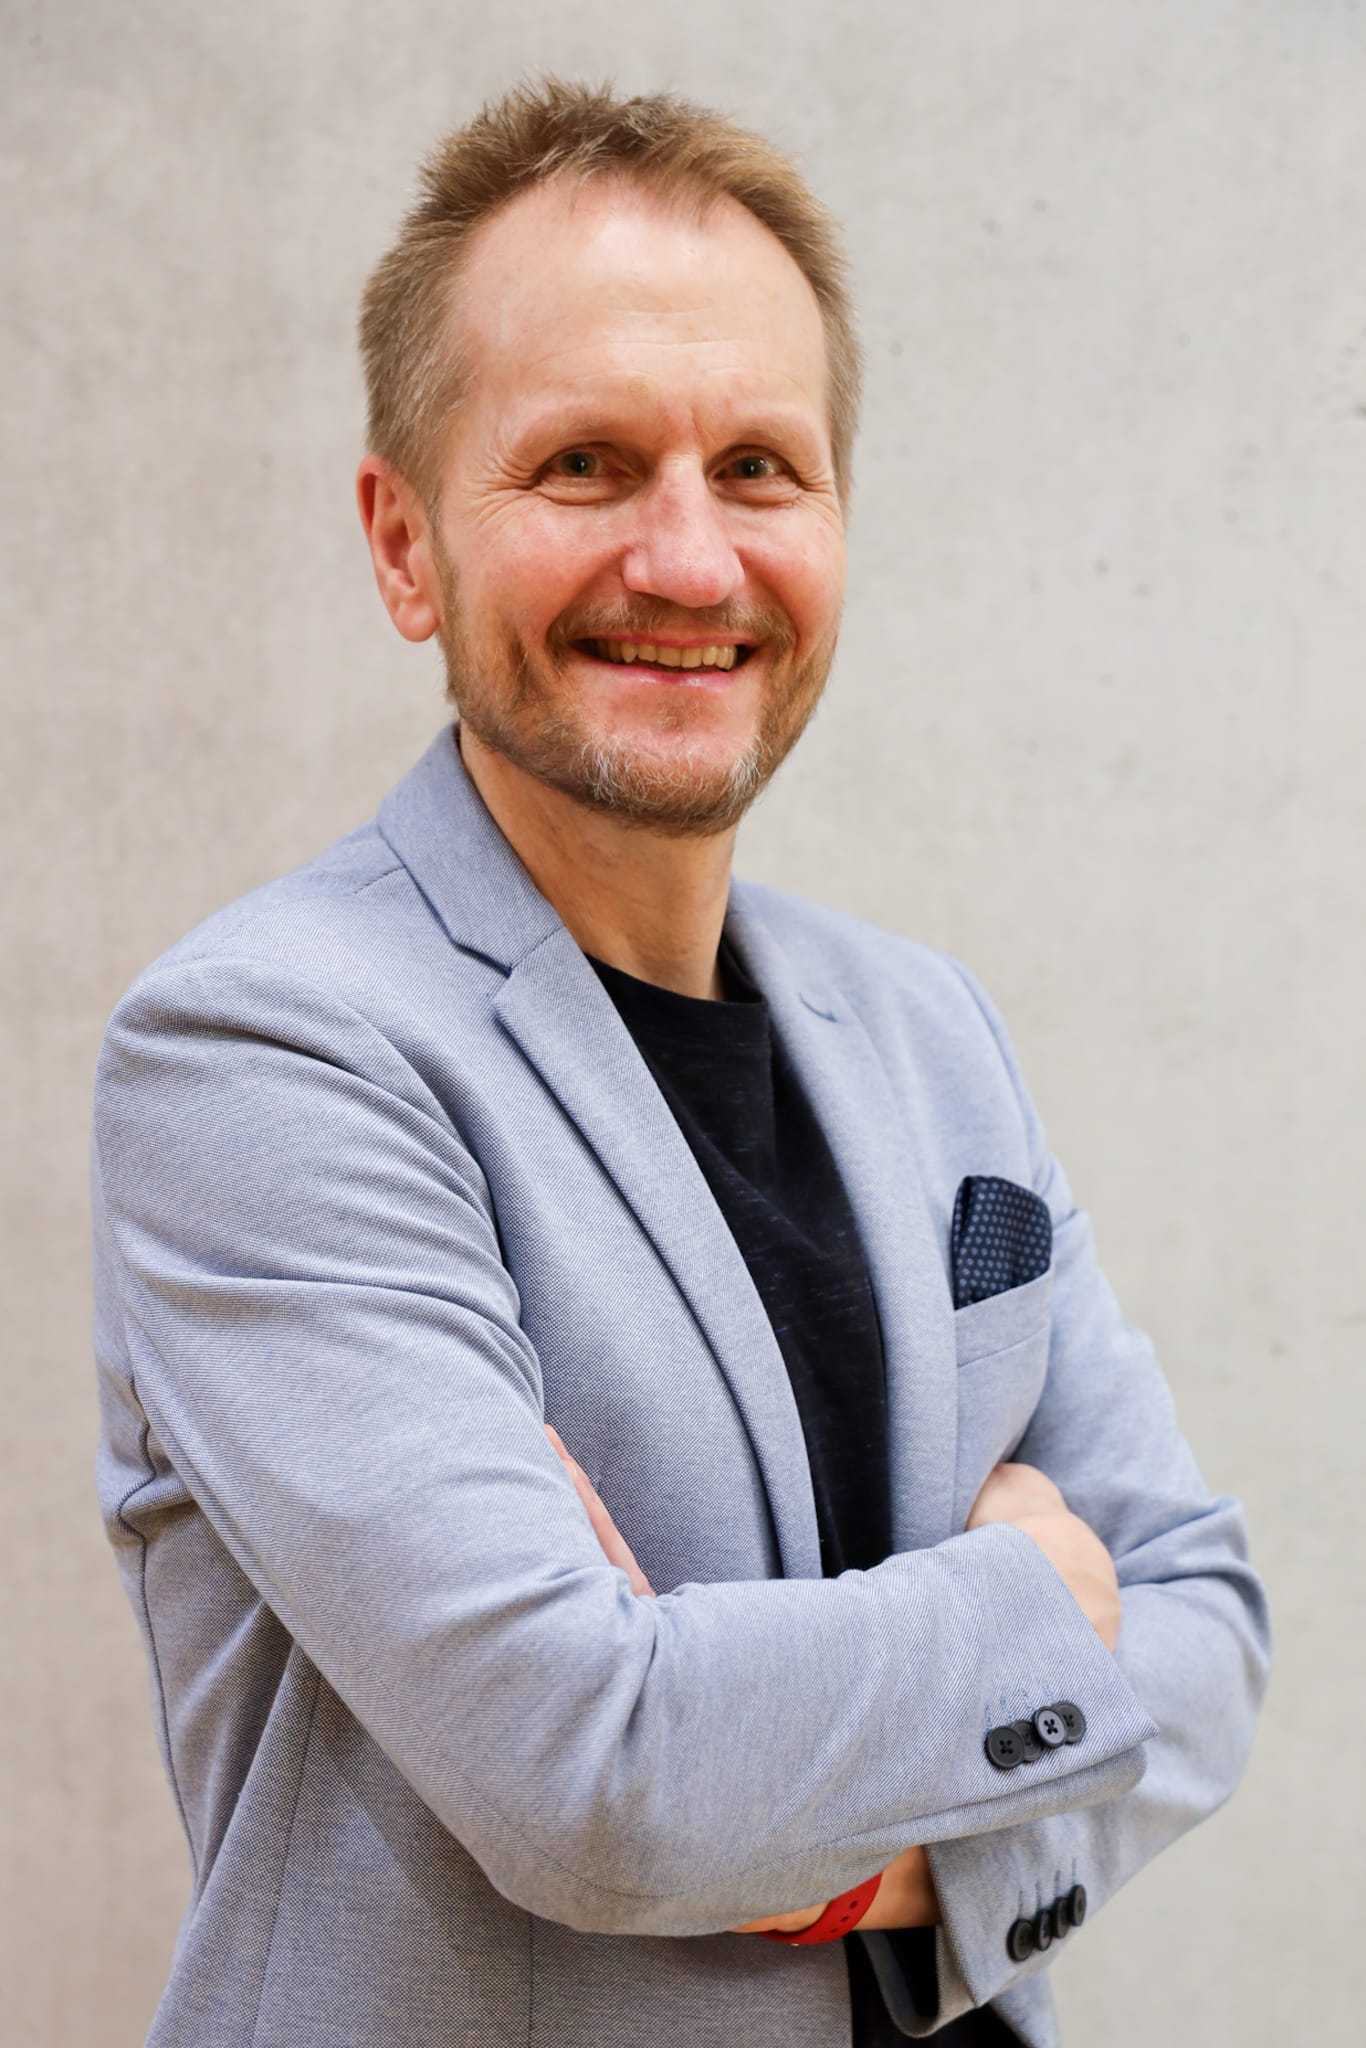 Prof. Dr. Sven Reinecke